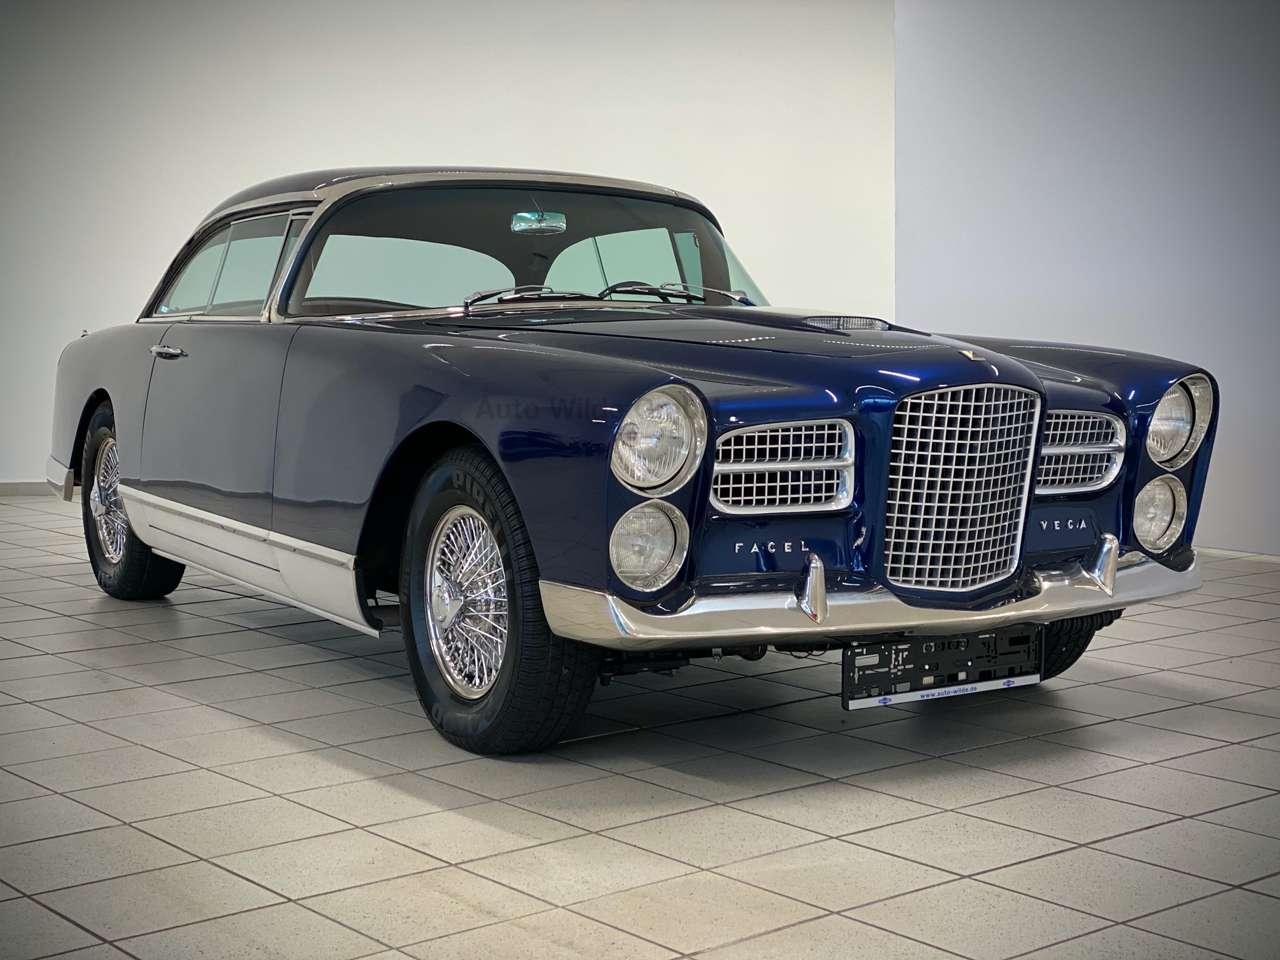 1959-FACEL-VEGA-FACEL-00-(1)